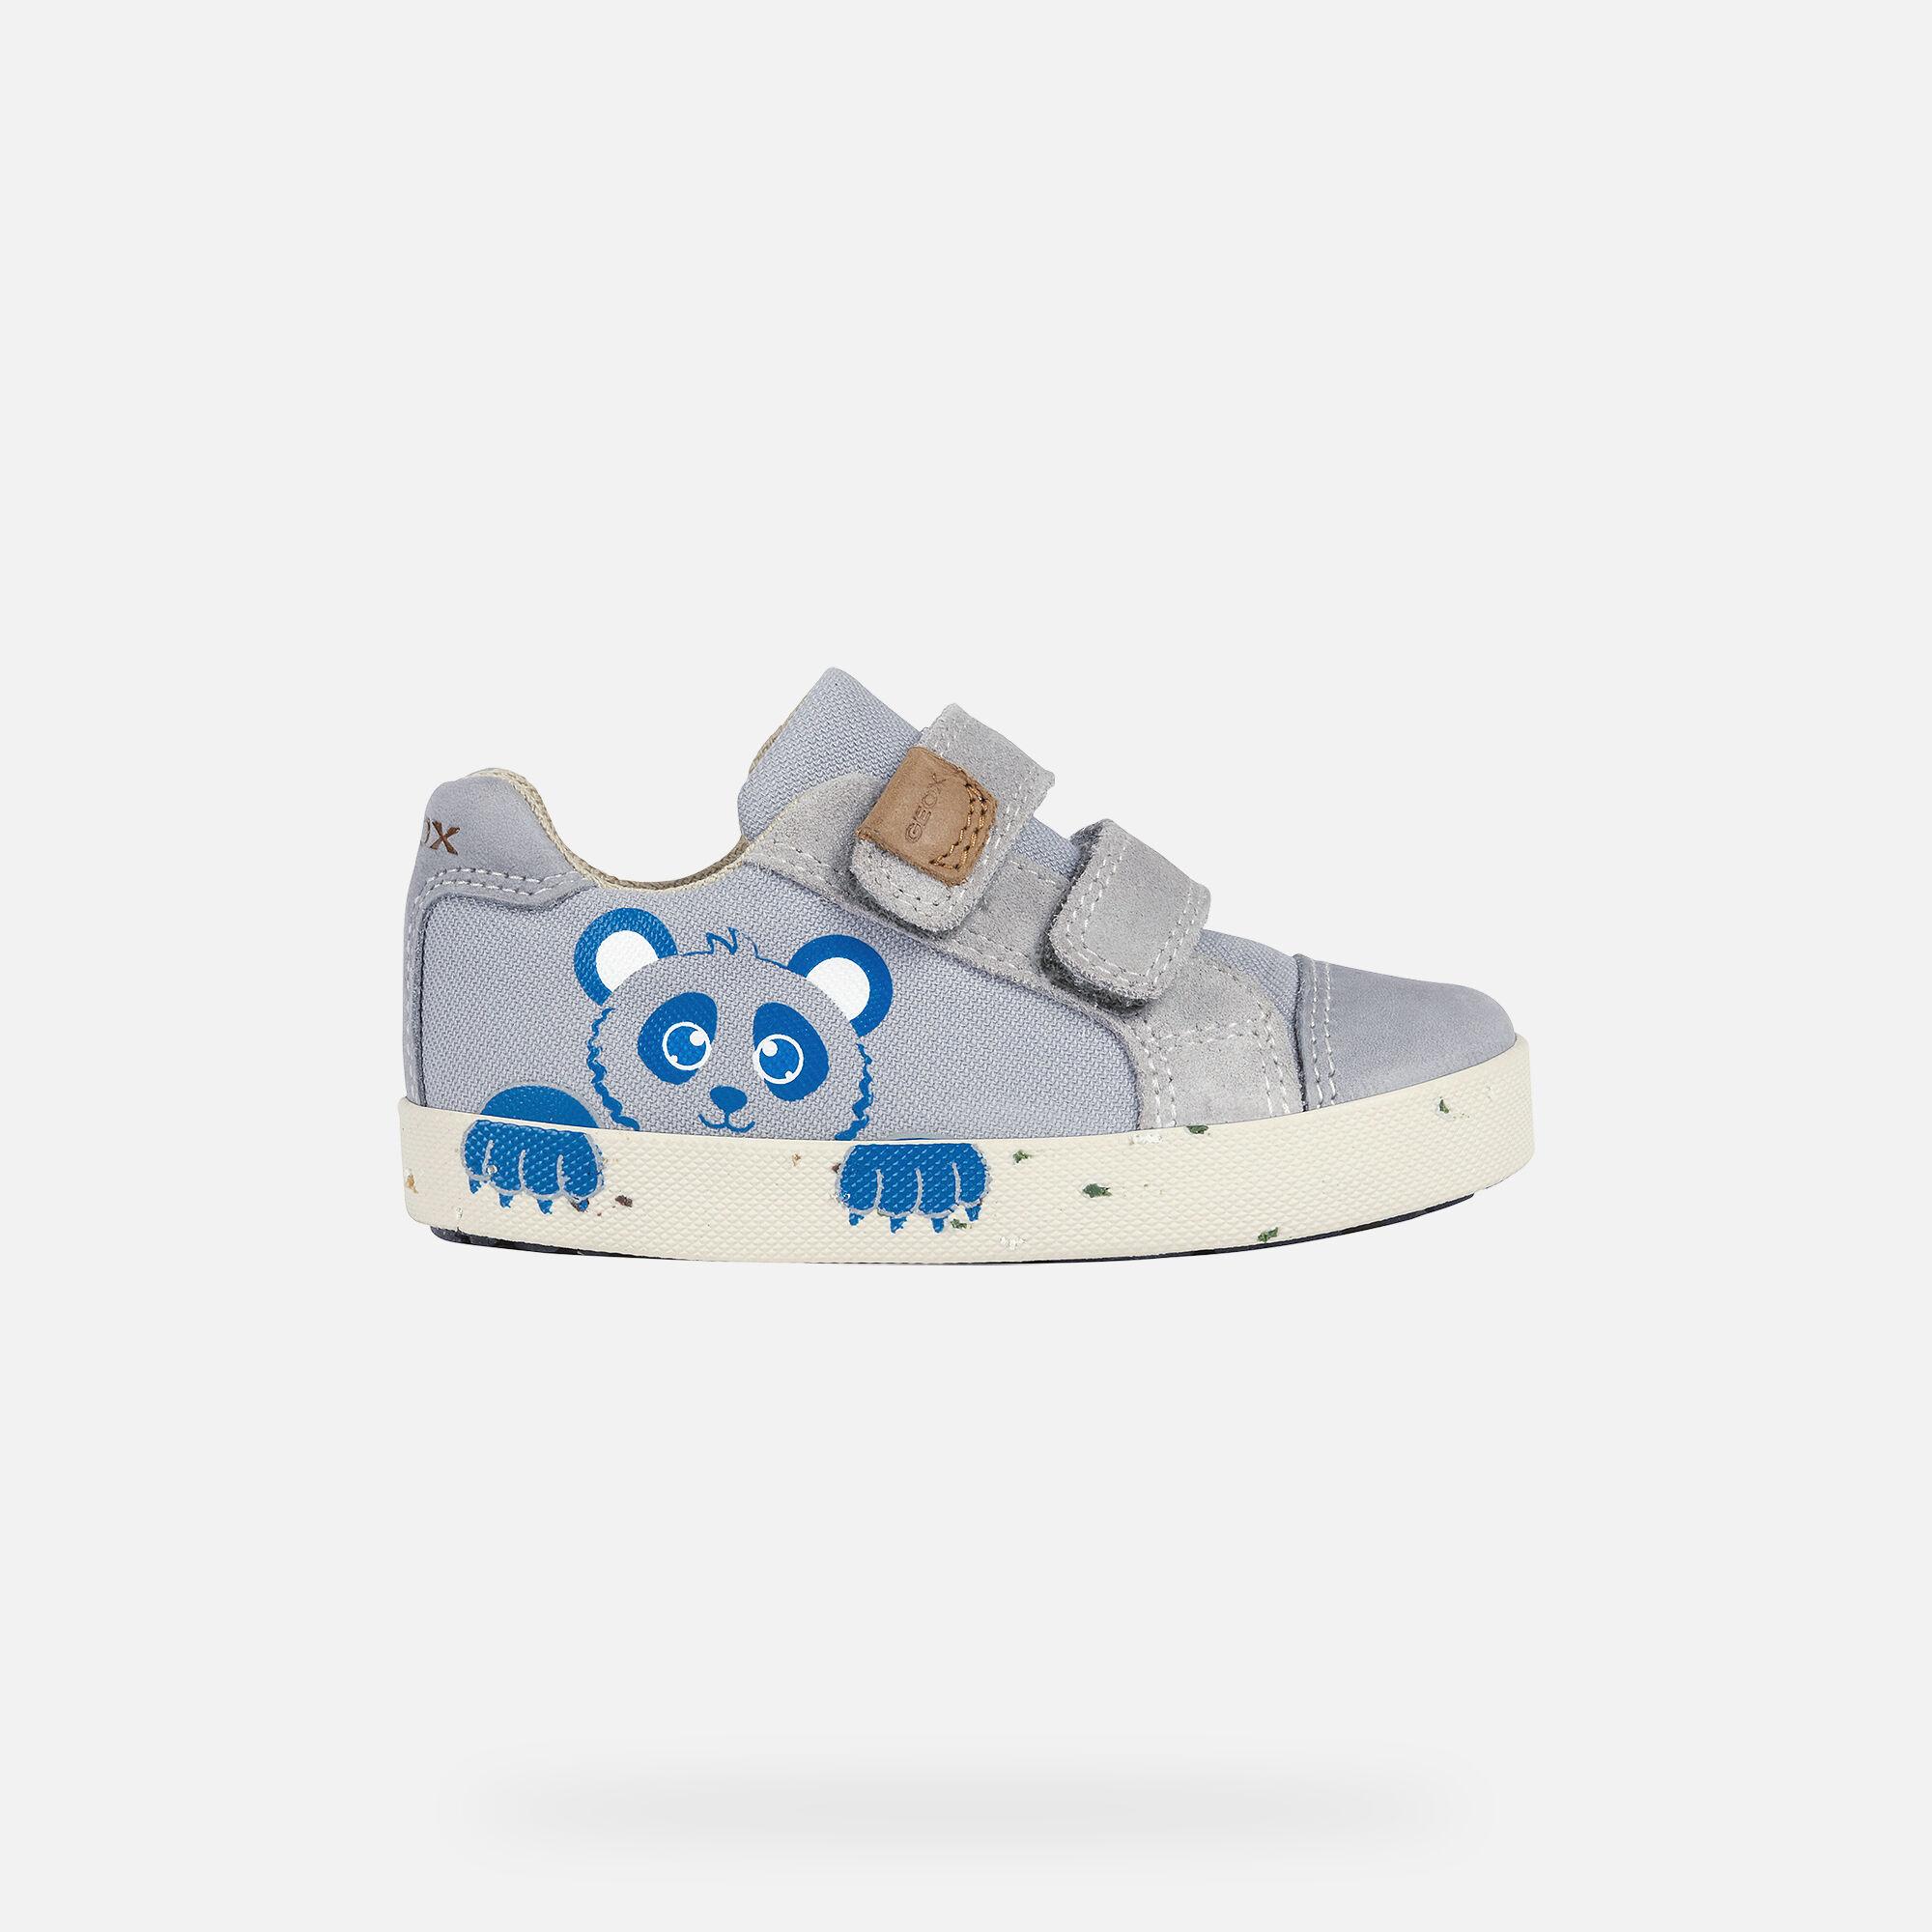 Geox Junior Kilwi Boys Shoes | Charles